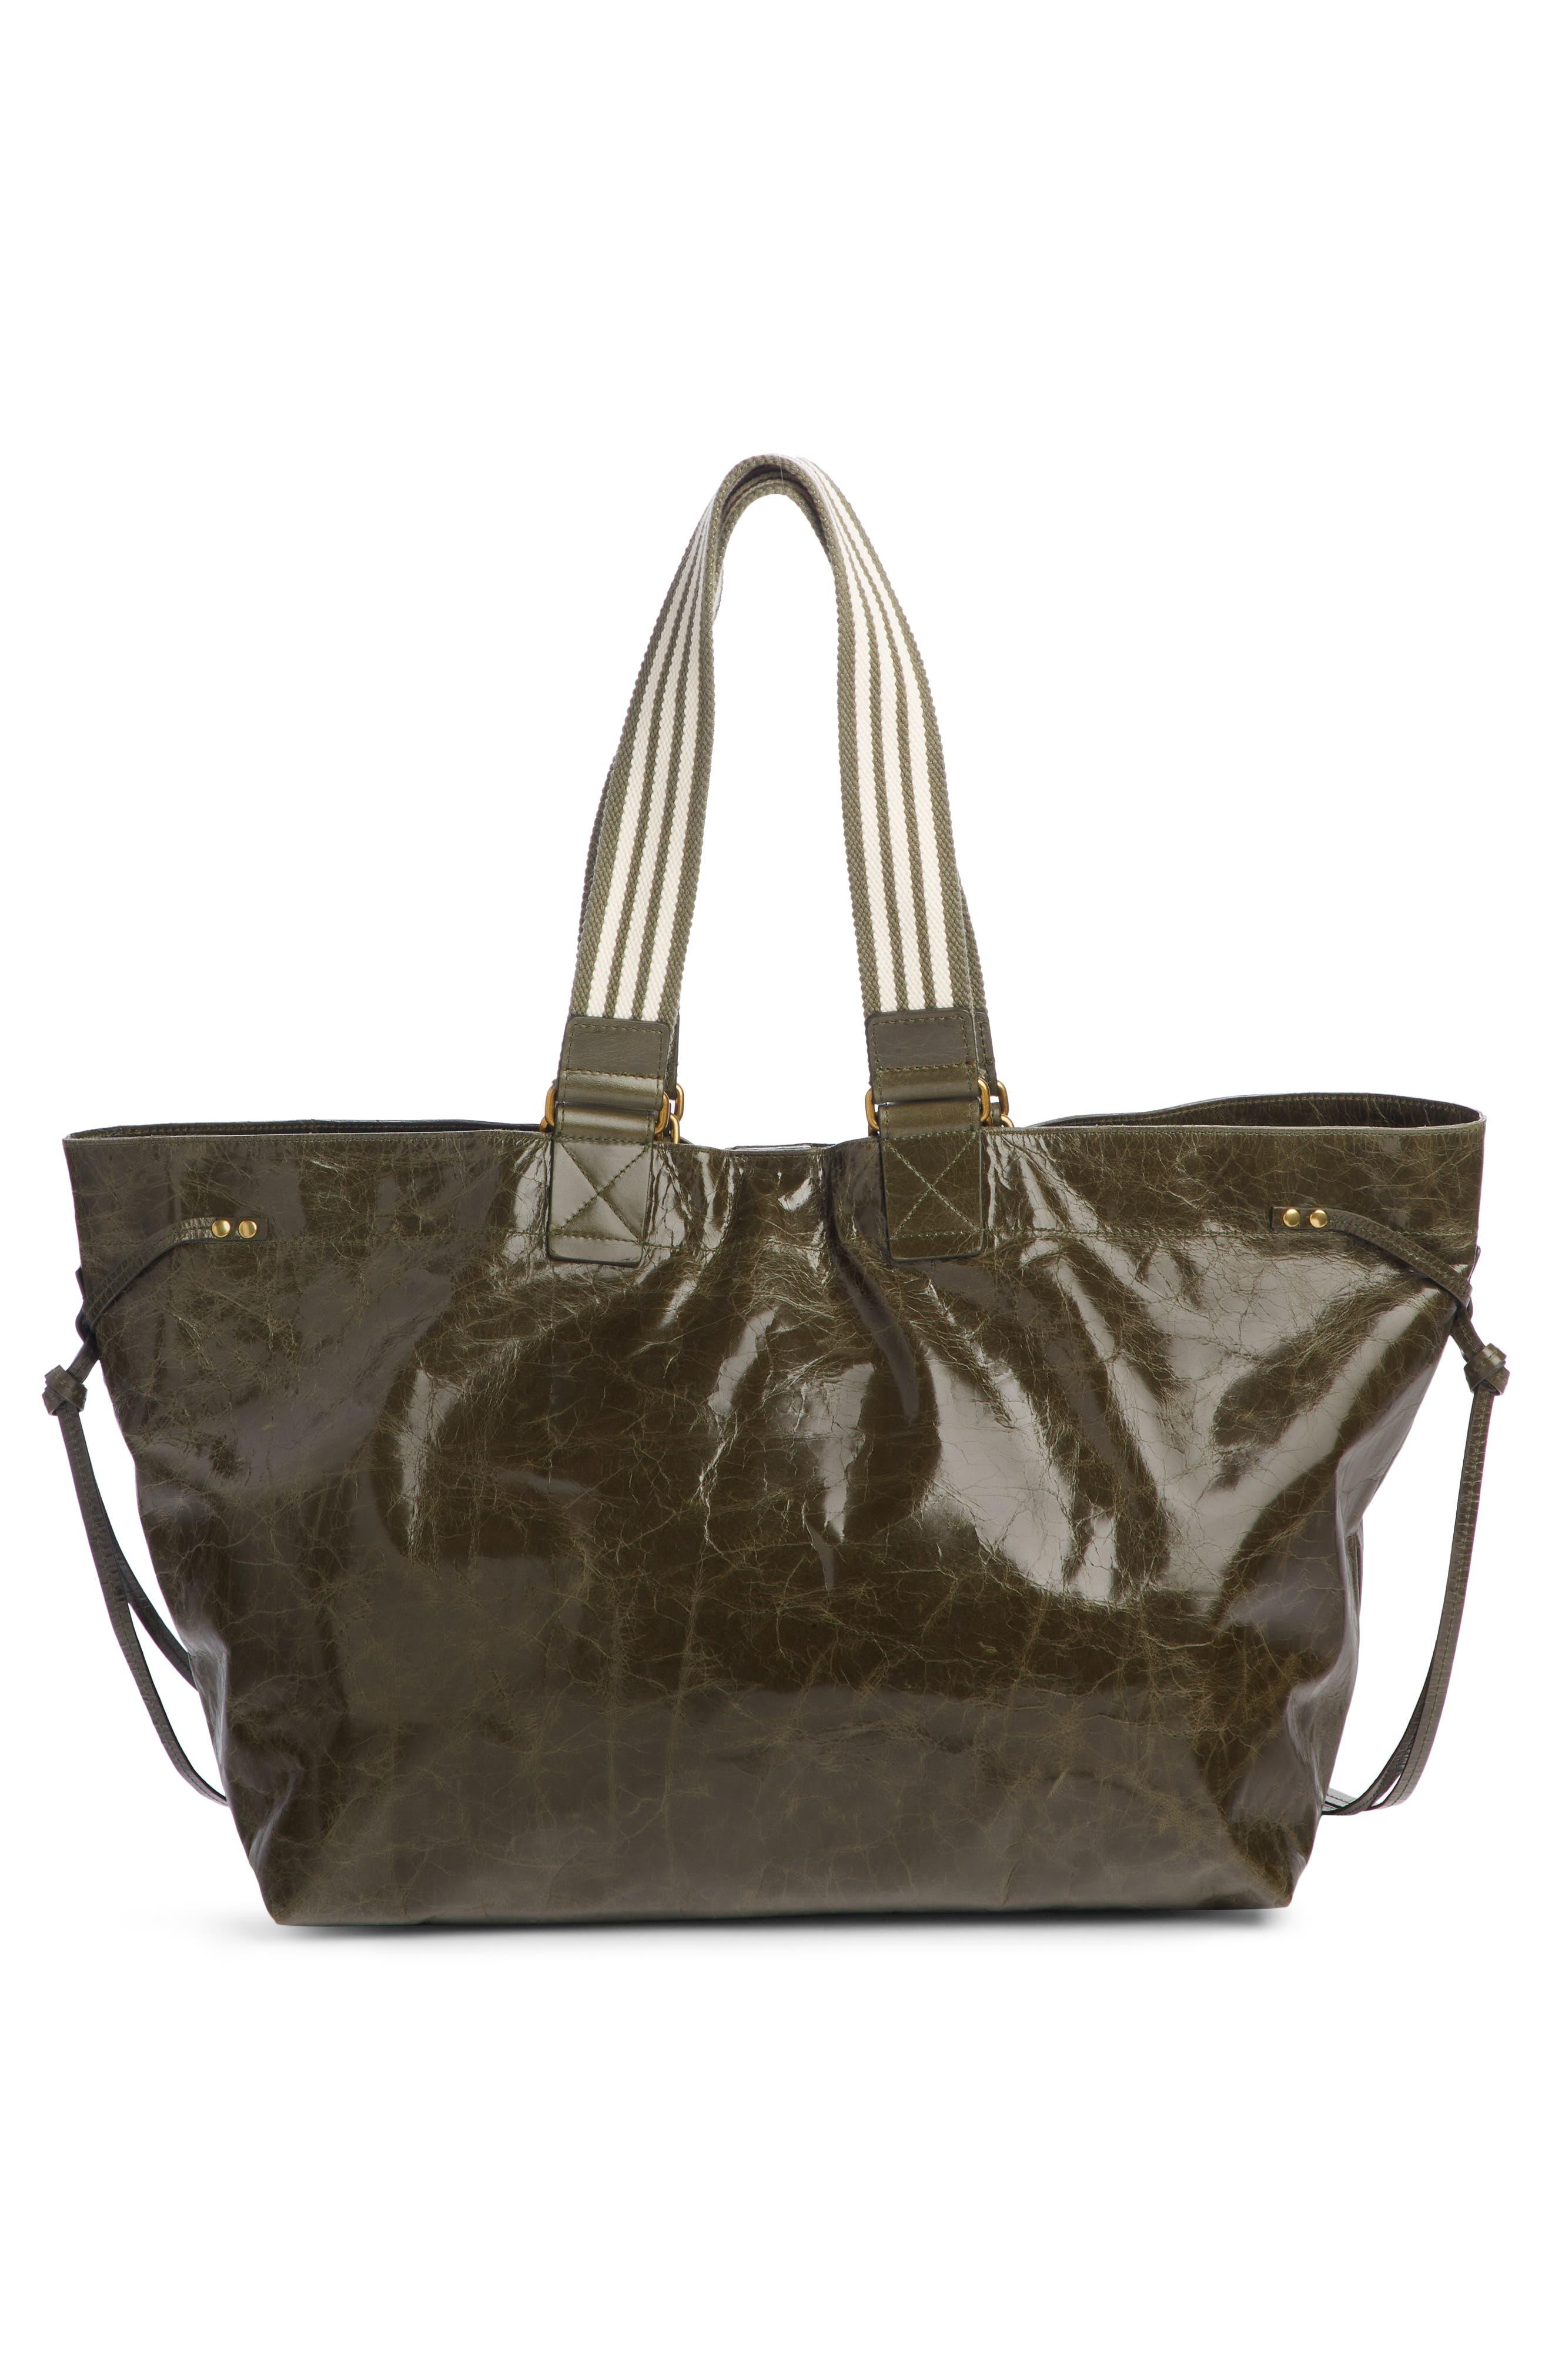 ISABEL MARANT,                             Wardy New Leather Shopper,                             Alternate thumbnail 3, color,                             KHAKI